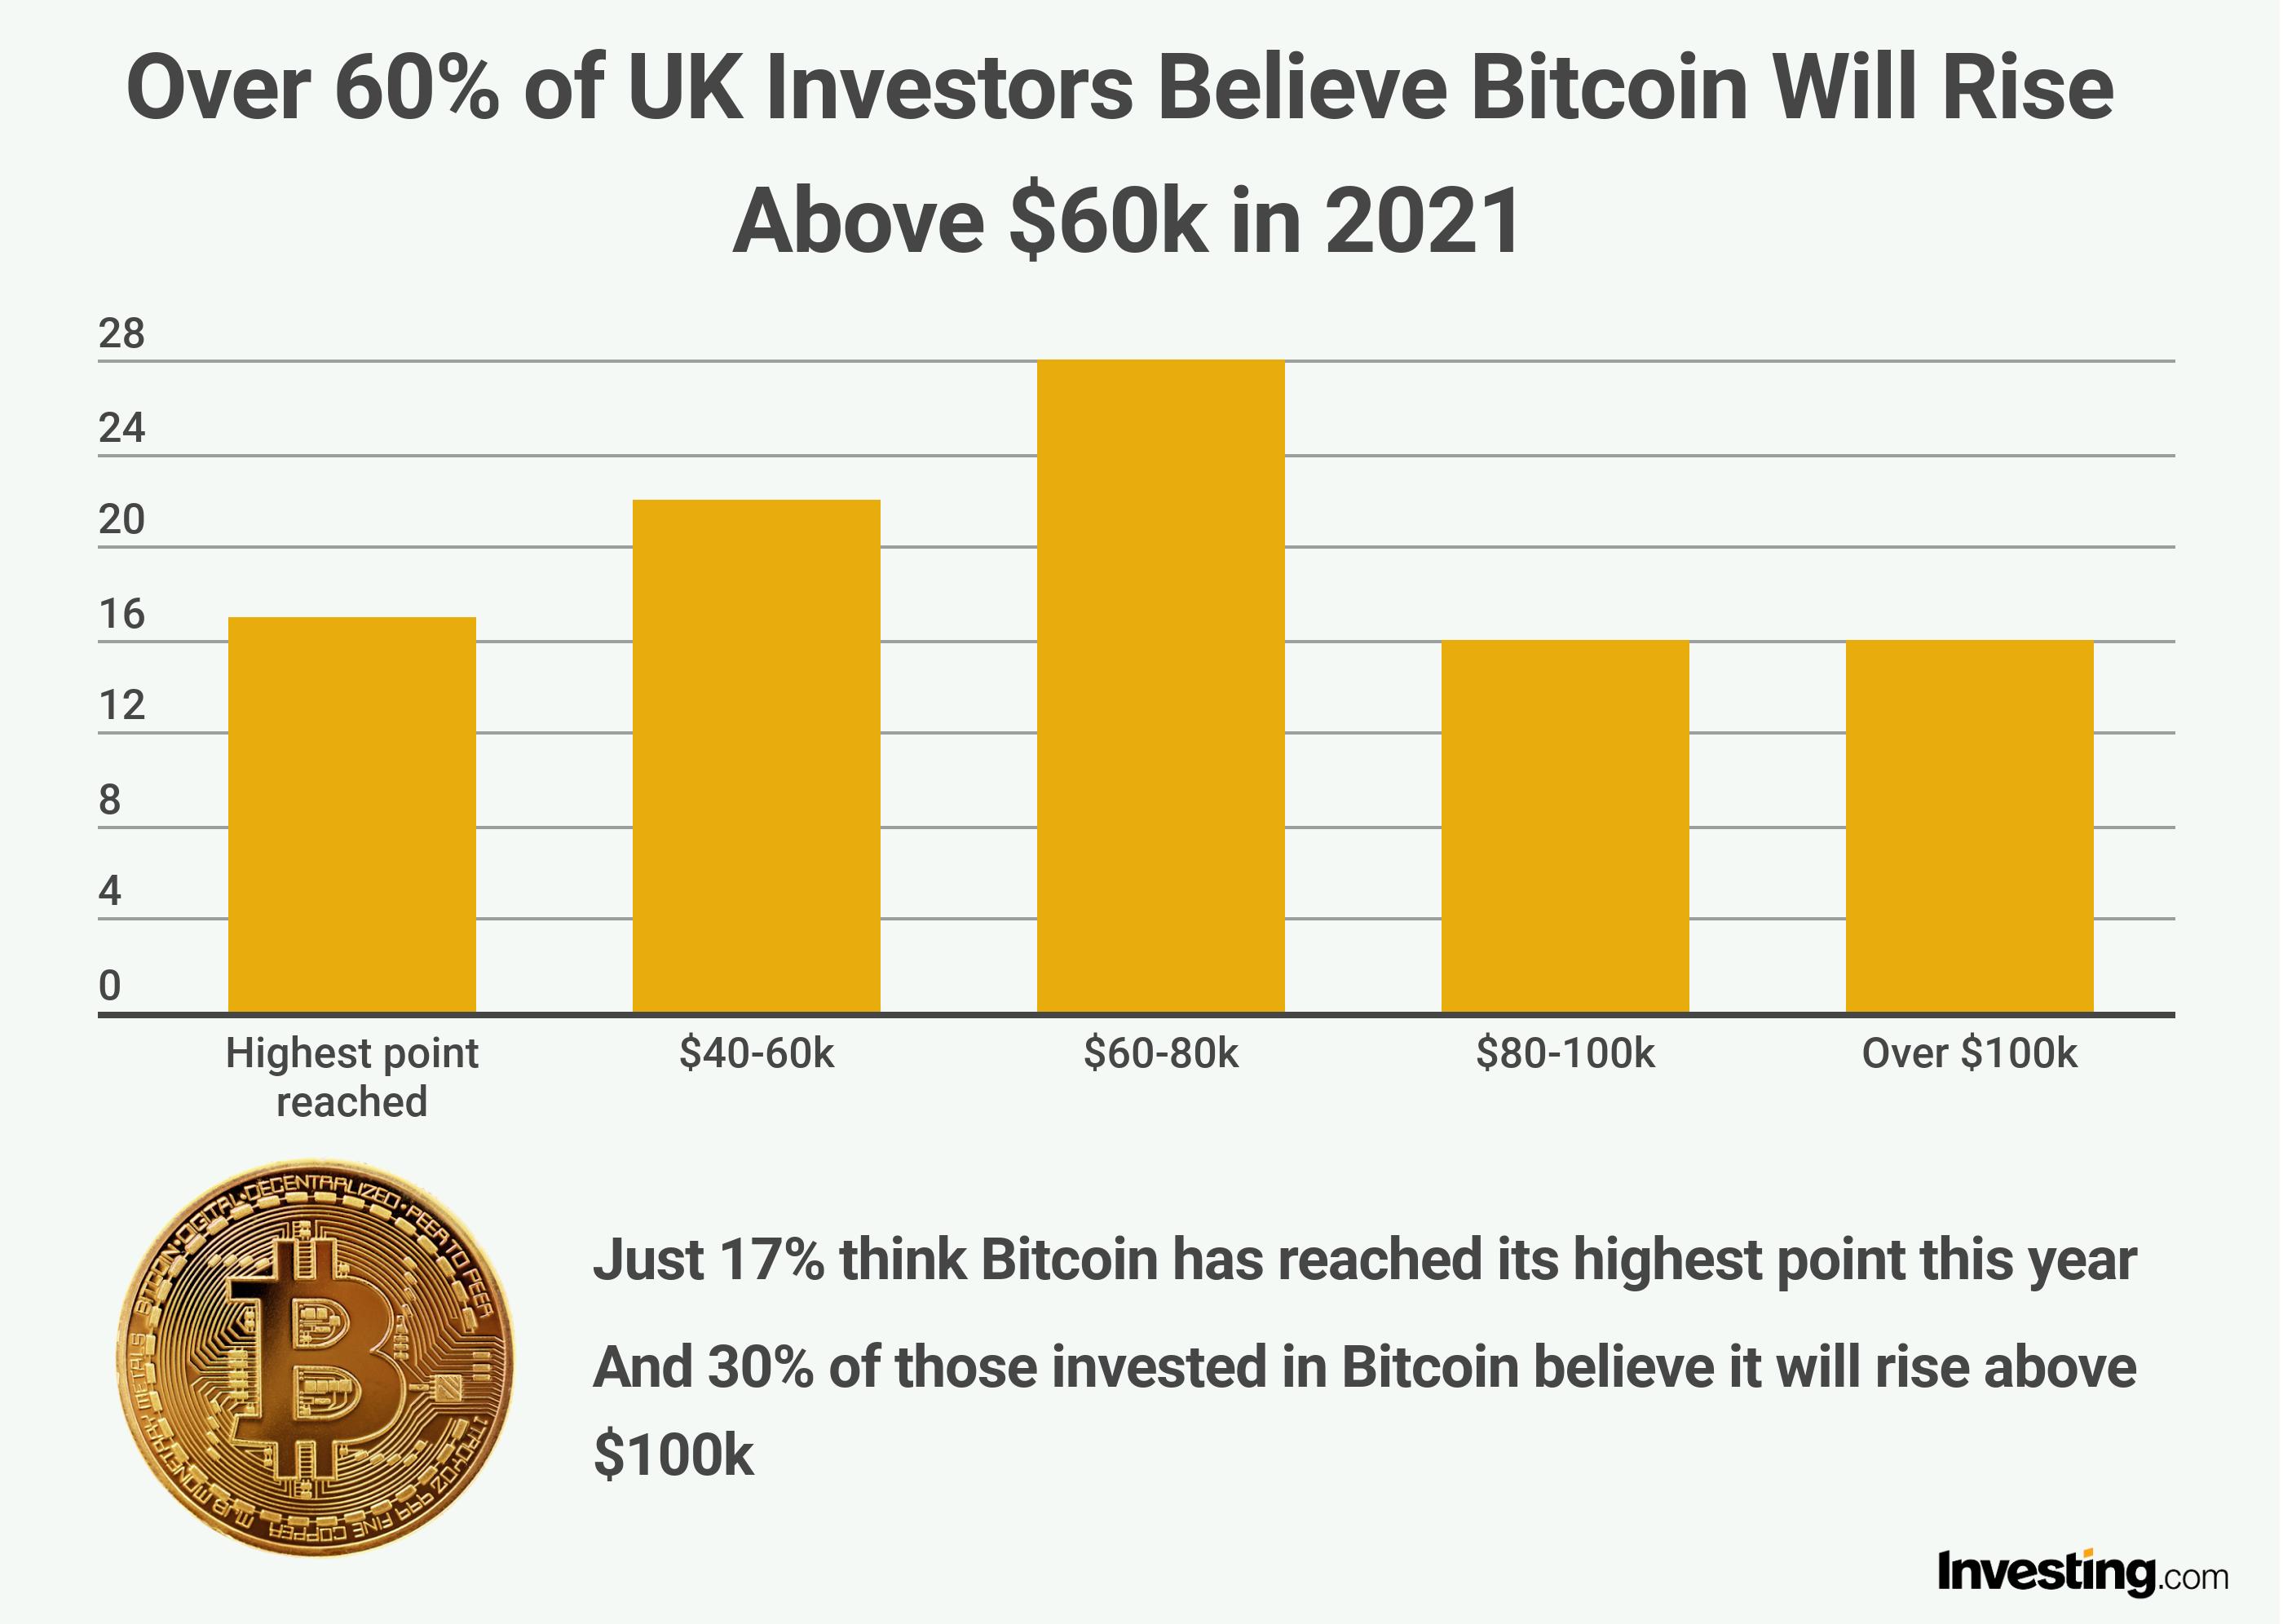 Bitcoin Price in 2021